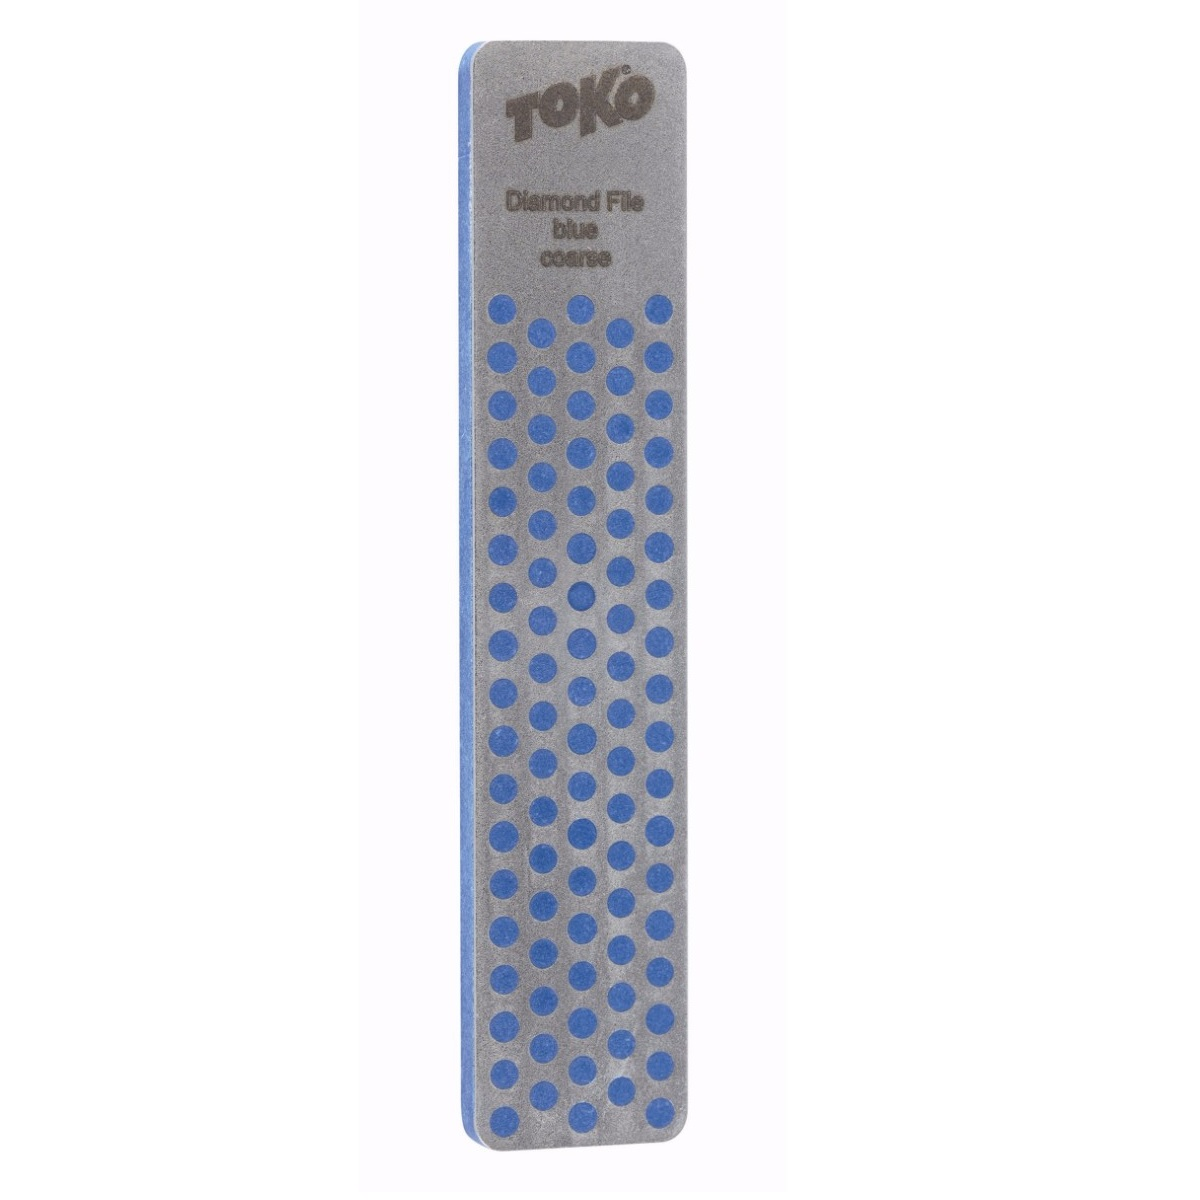 TOKO DMT DIAMOND FILE BLUE (Toko)TOKO DMT DIAMOND FILE BLUE (Toko)